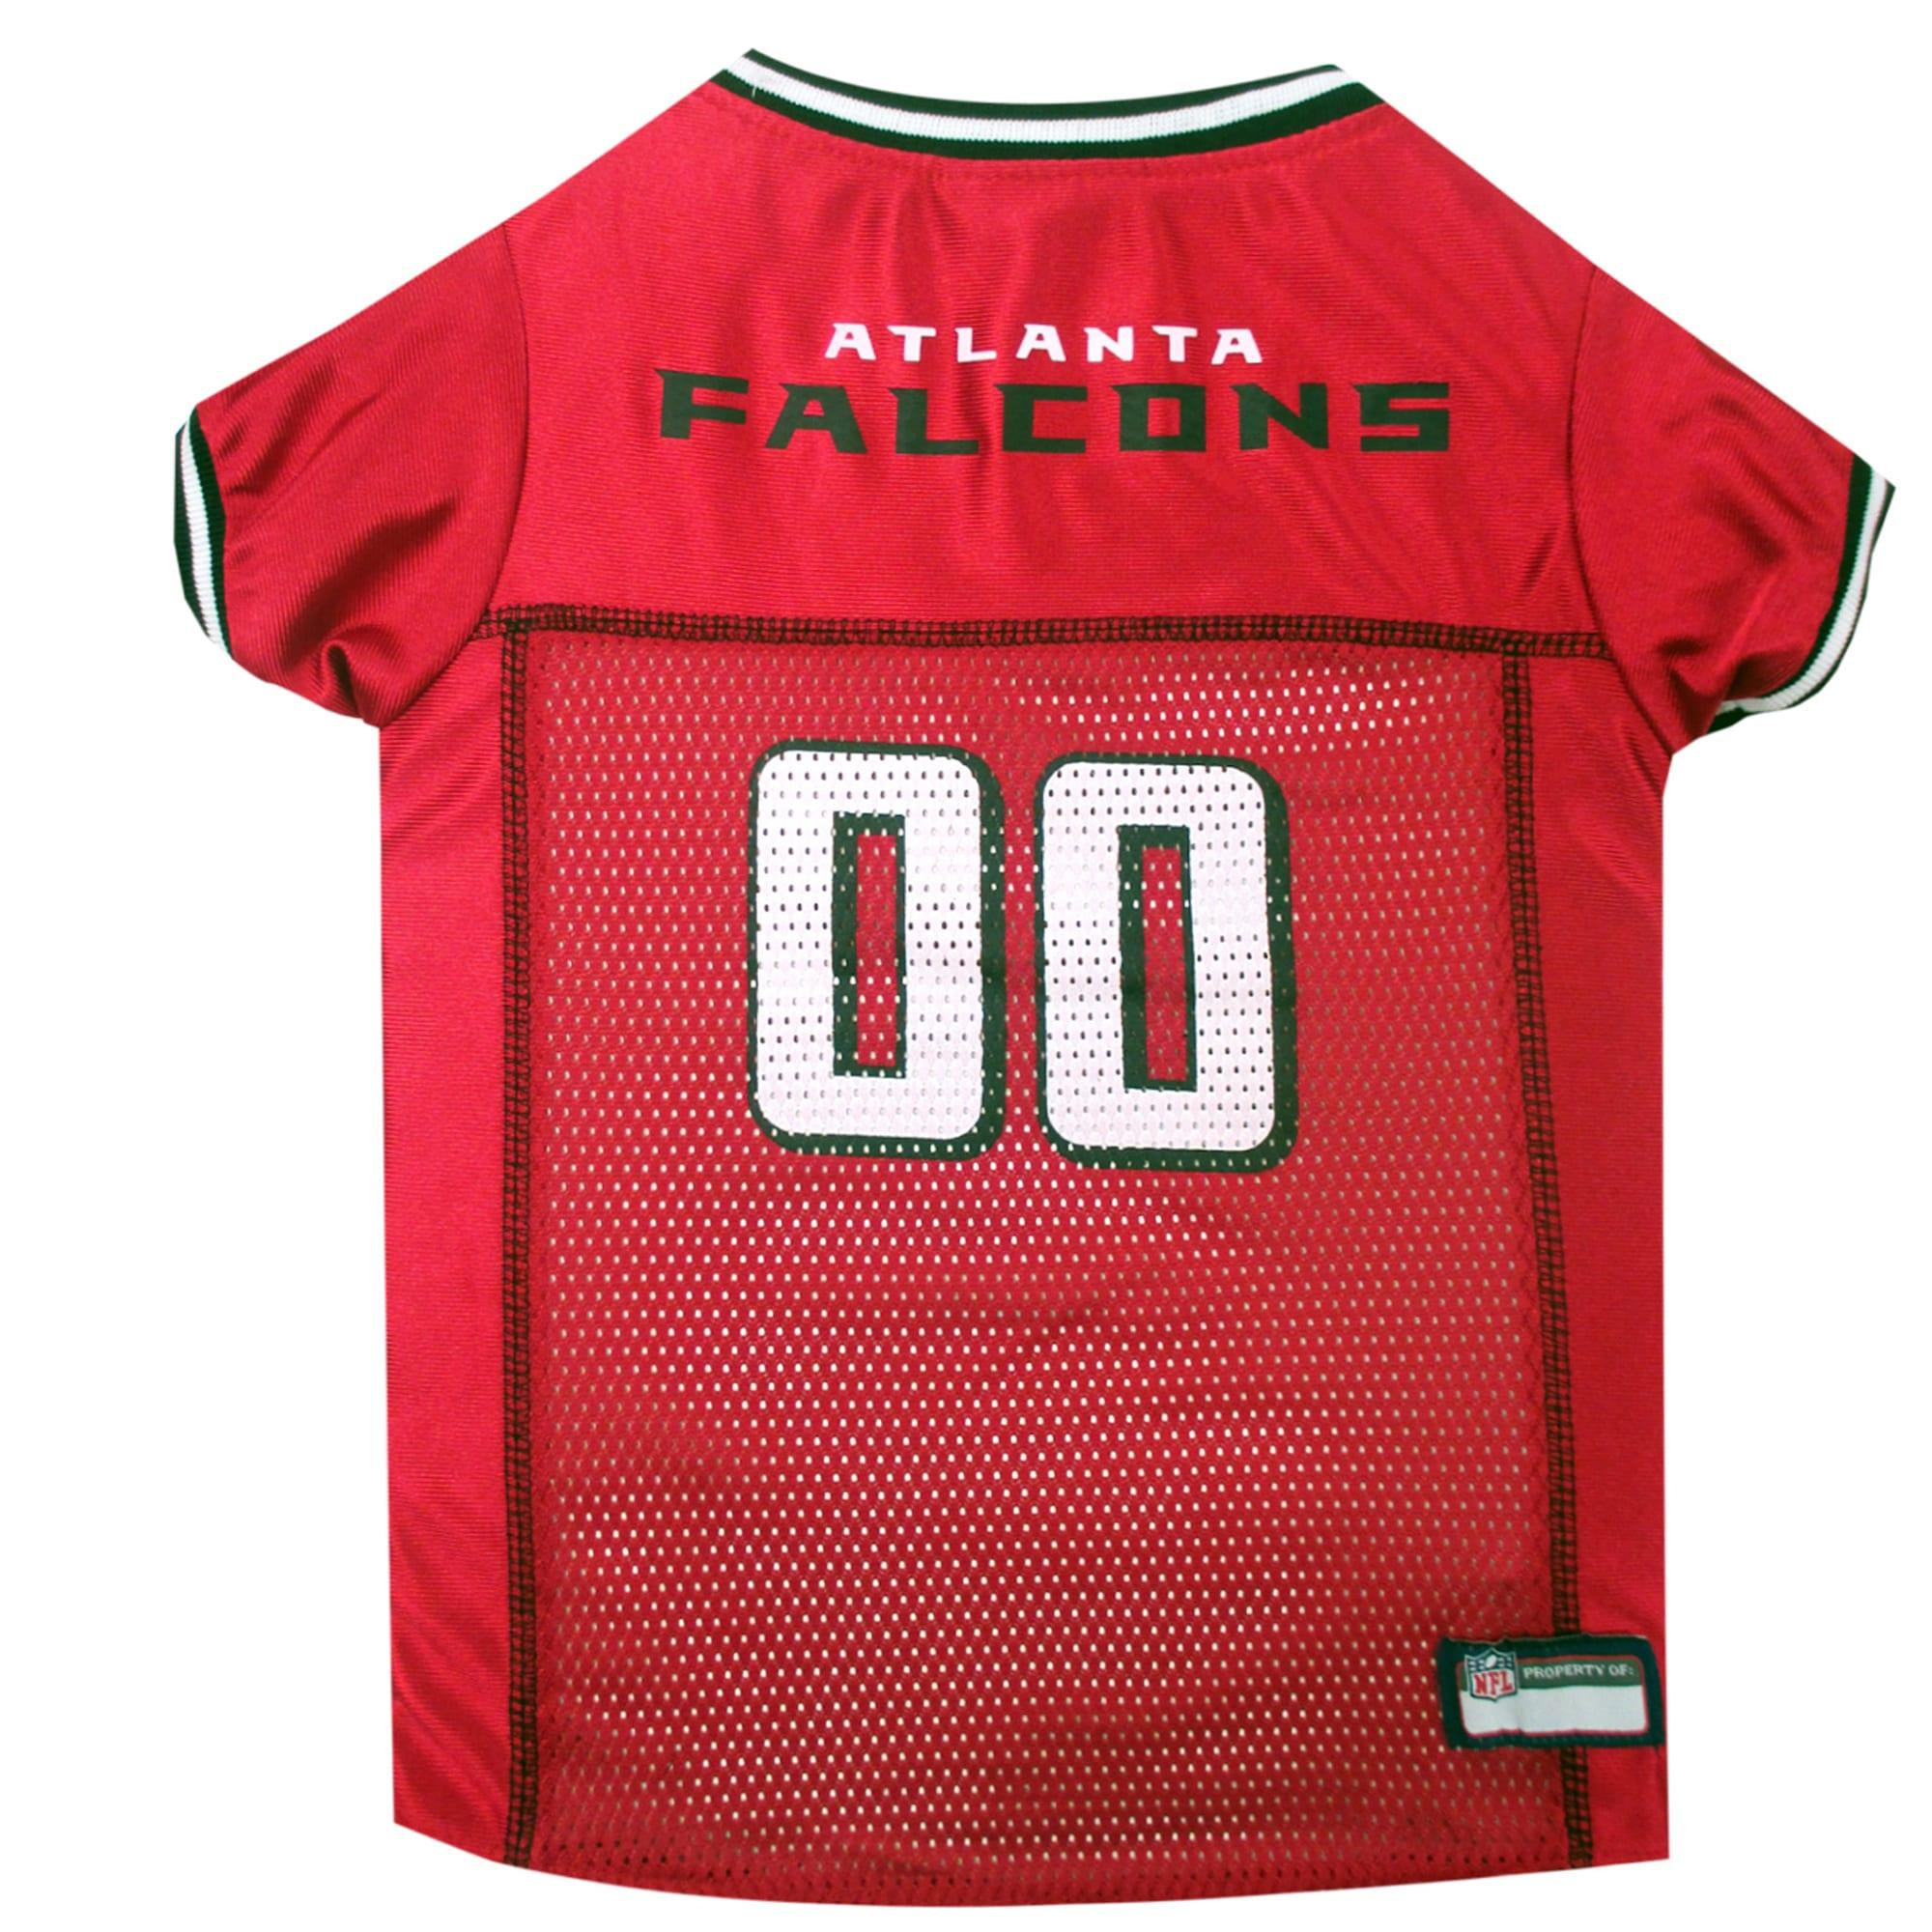 Pets First Atlanta Falcons NFL Mesh Pet Jersey, X-Small